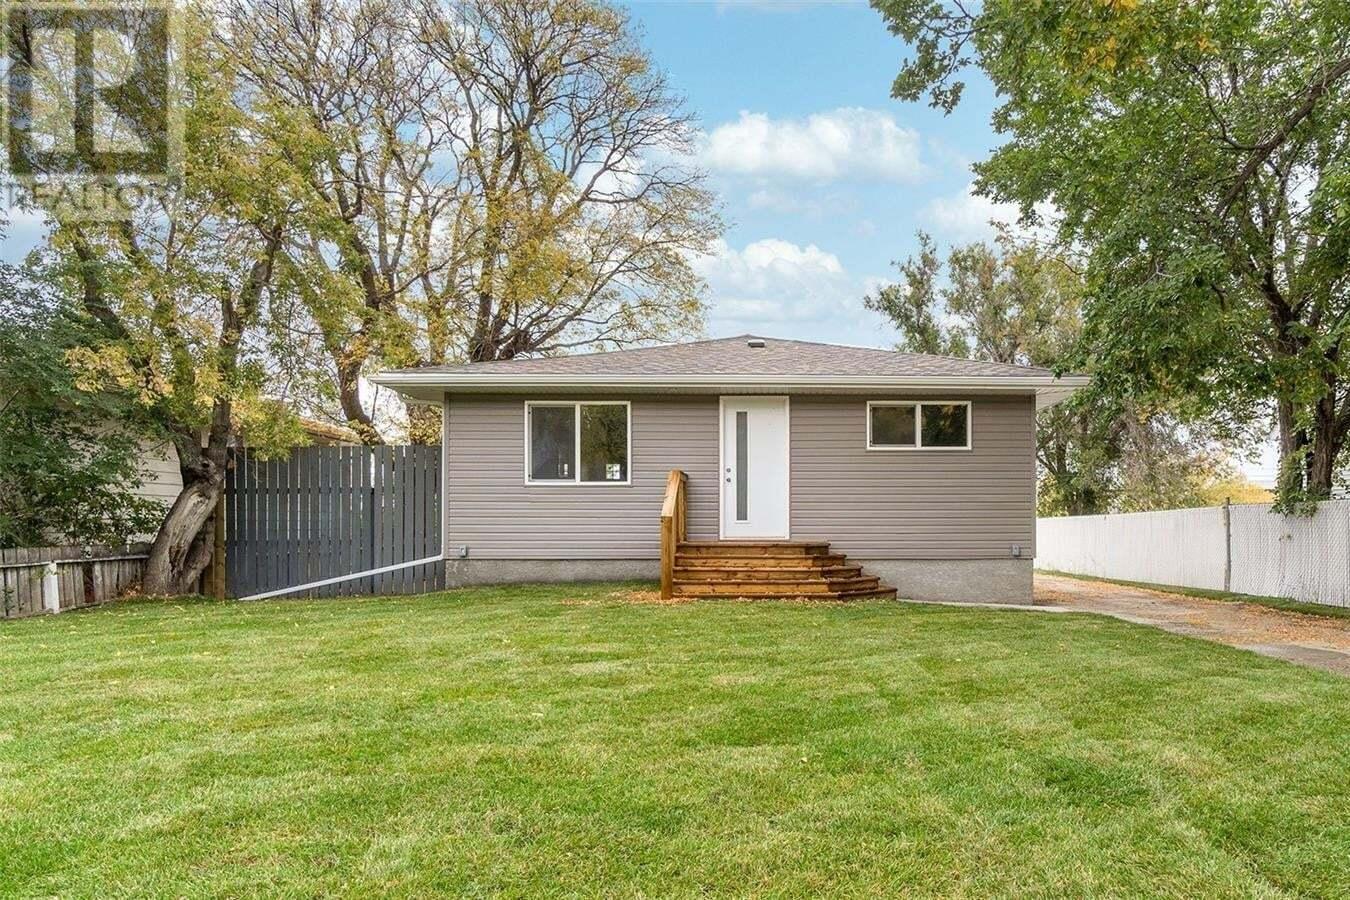 House for sale at 840 Coteau St W Moose Jaw Saskatchewan - MLS: SK827895